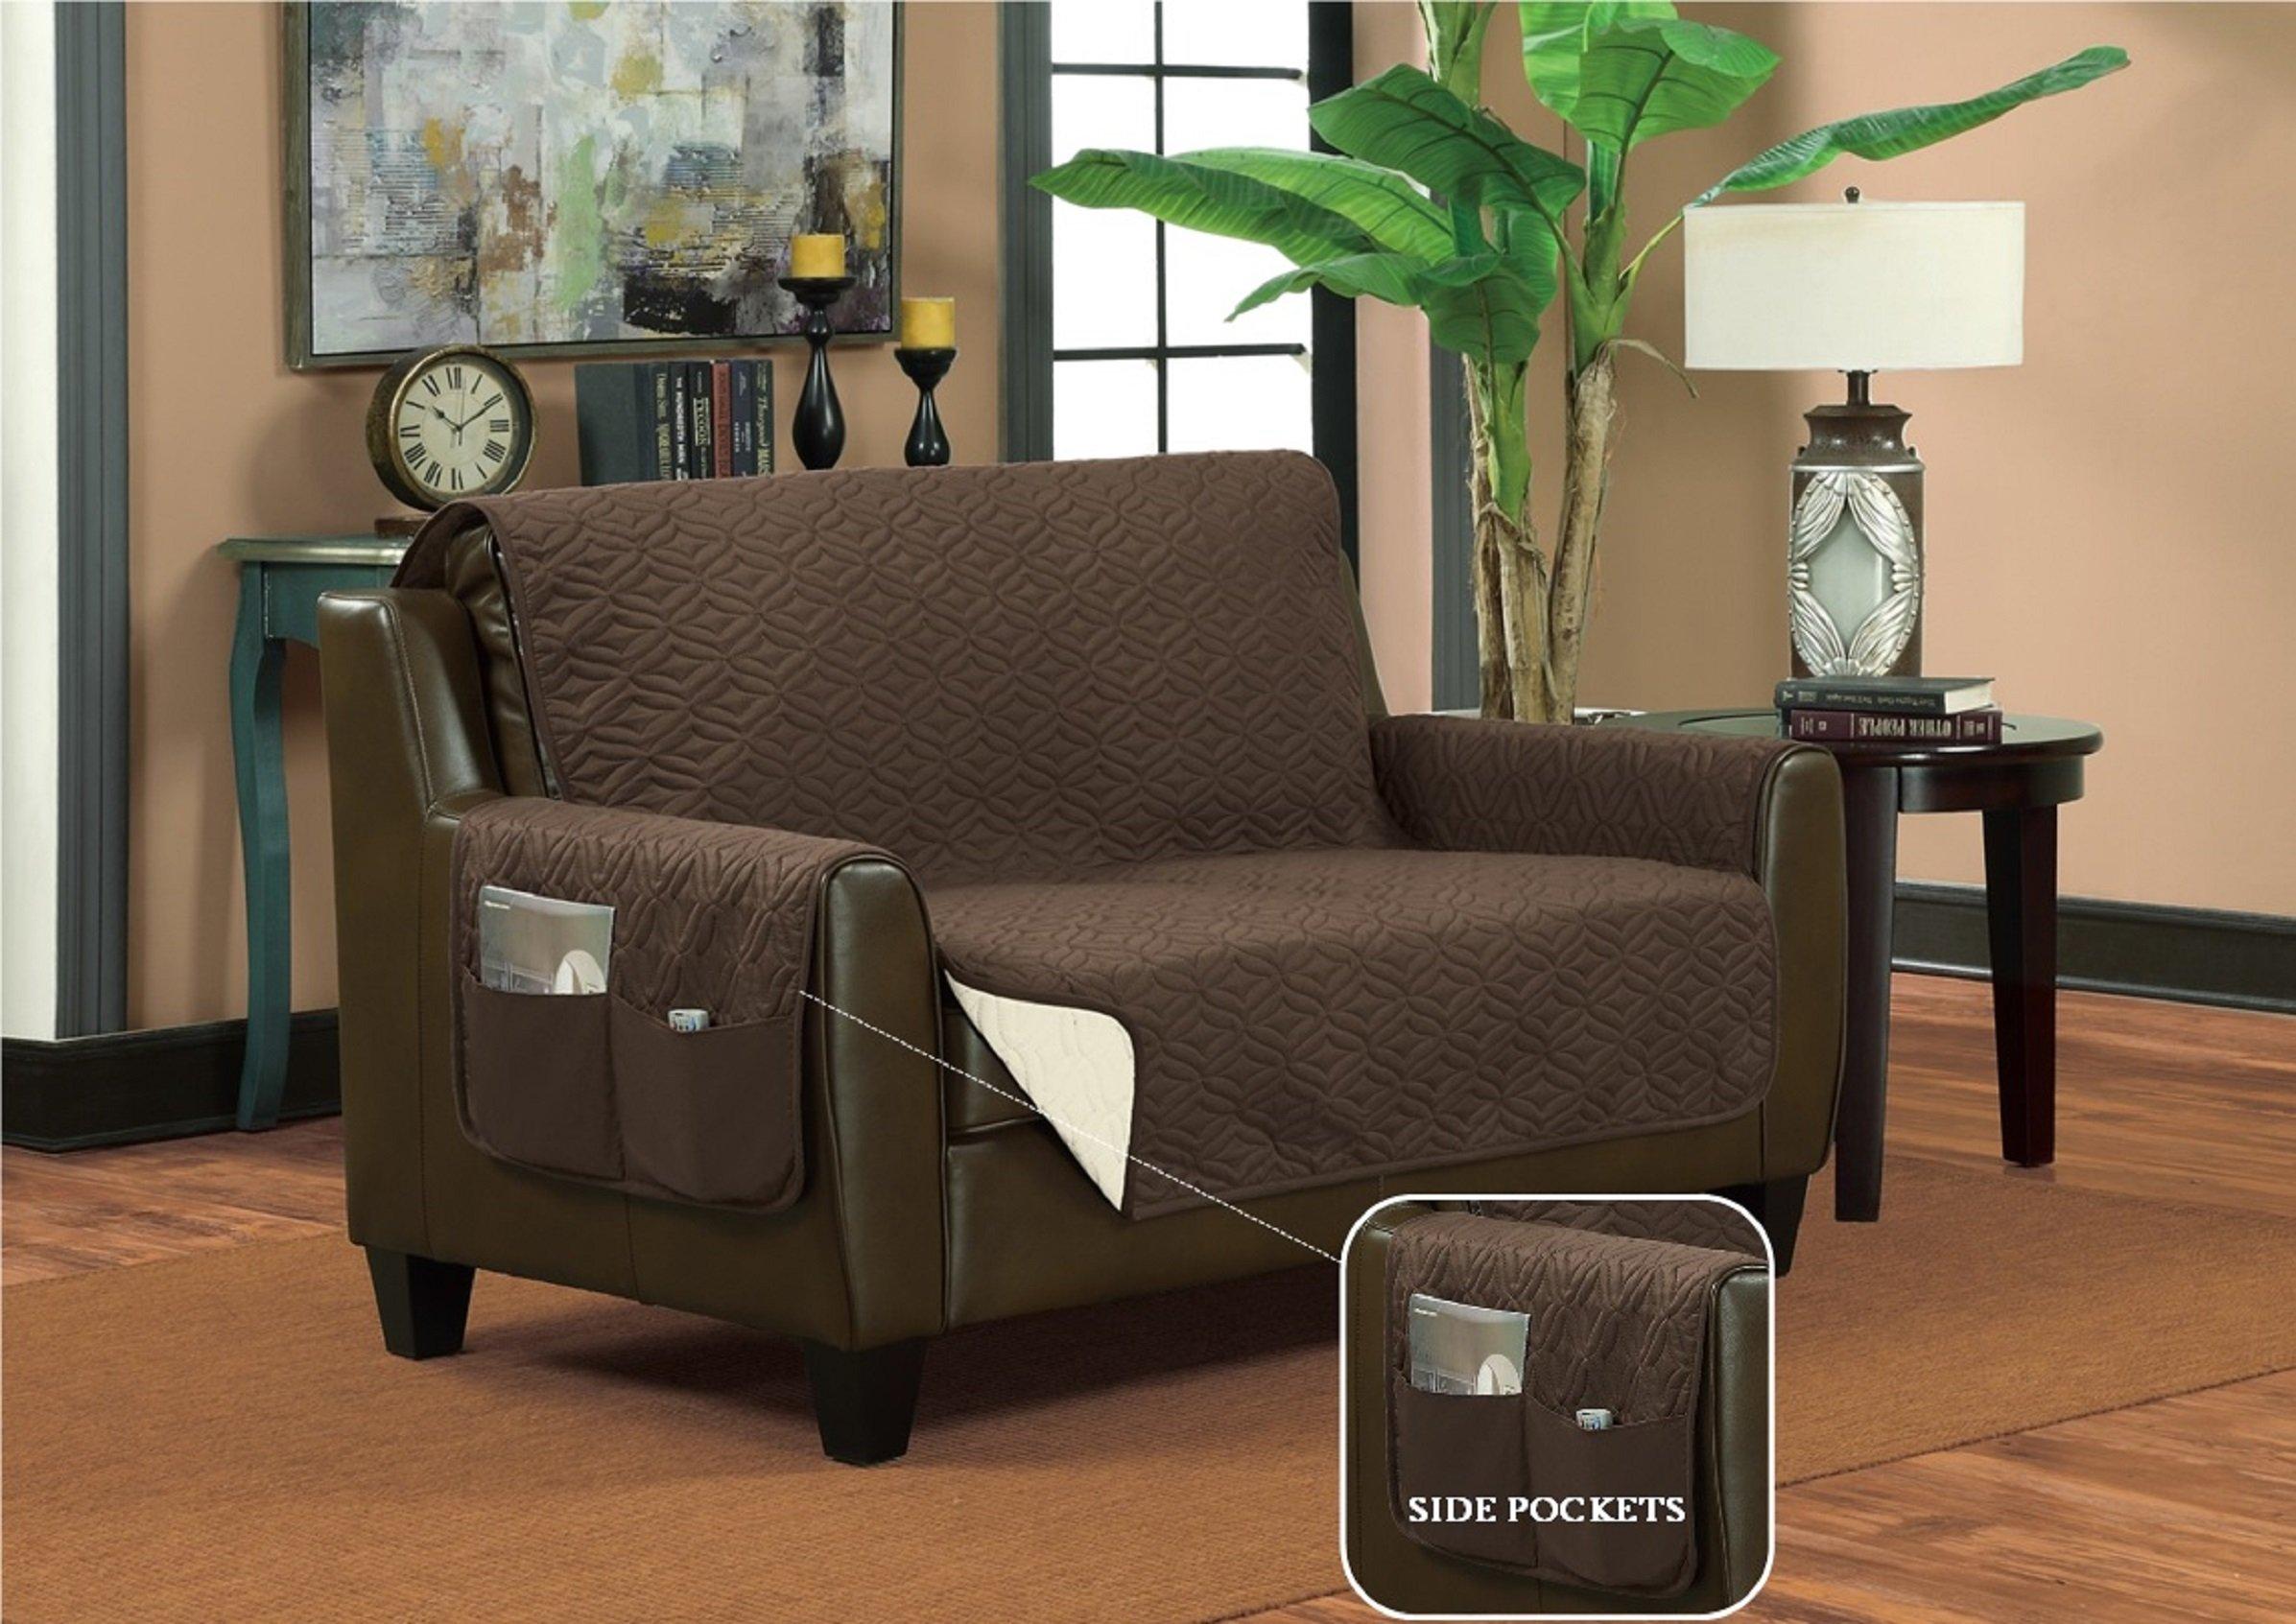 Bella Kline Reversible SOFA Furniture Protector, With 2 Storage Pockets - Mocha / Tan by BELLA KLINE DESIGN (Image #2)